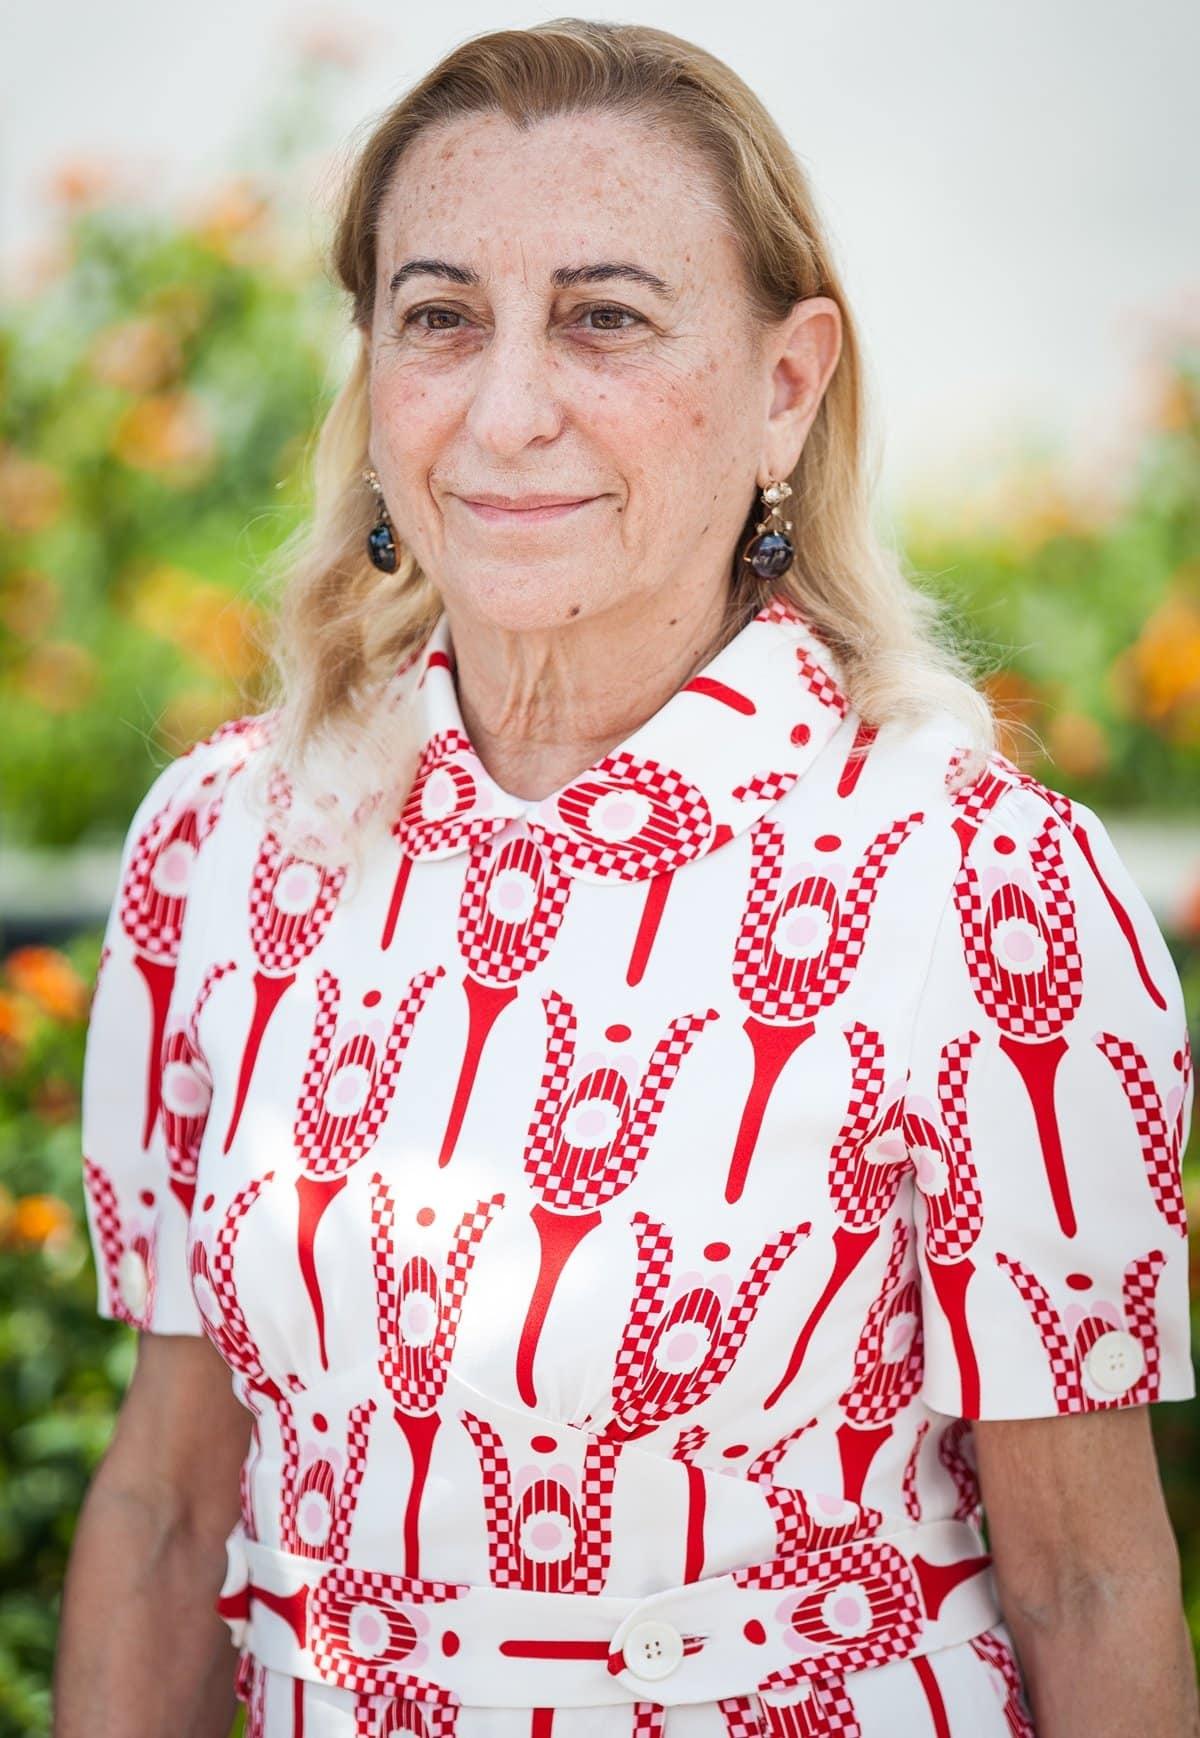 Miuccia Bianchi Prada, the head designer of Prada and the founder of its subsidiary Miu Miu, is the youngest granddaughter of Prada's founder Mario Prada